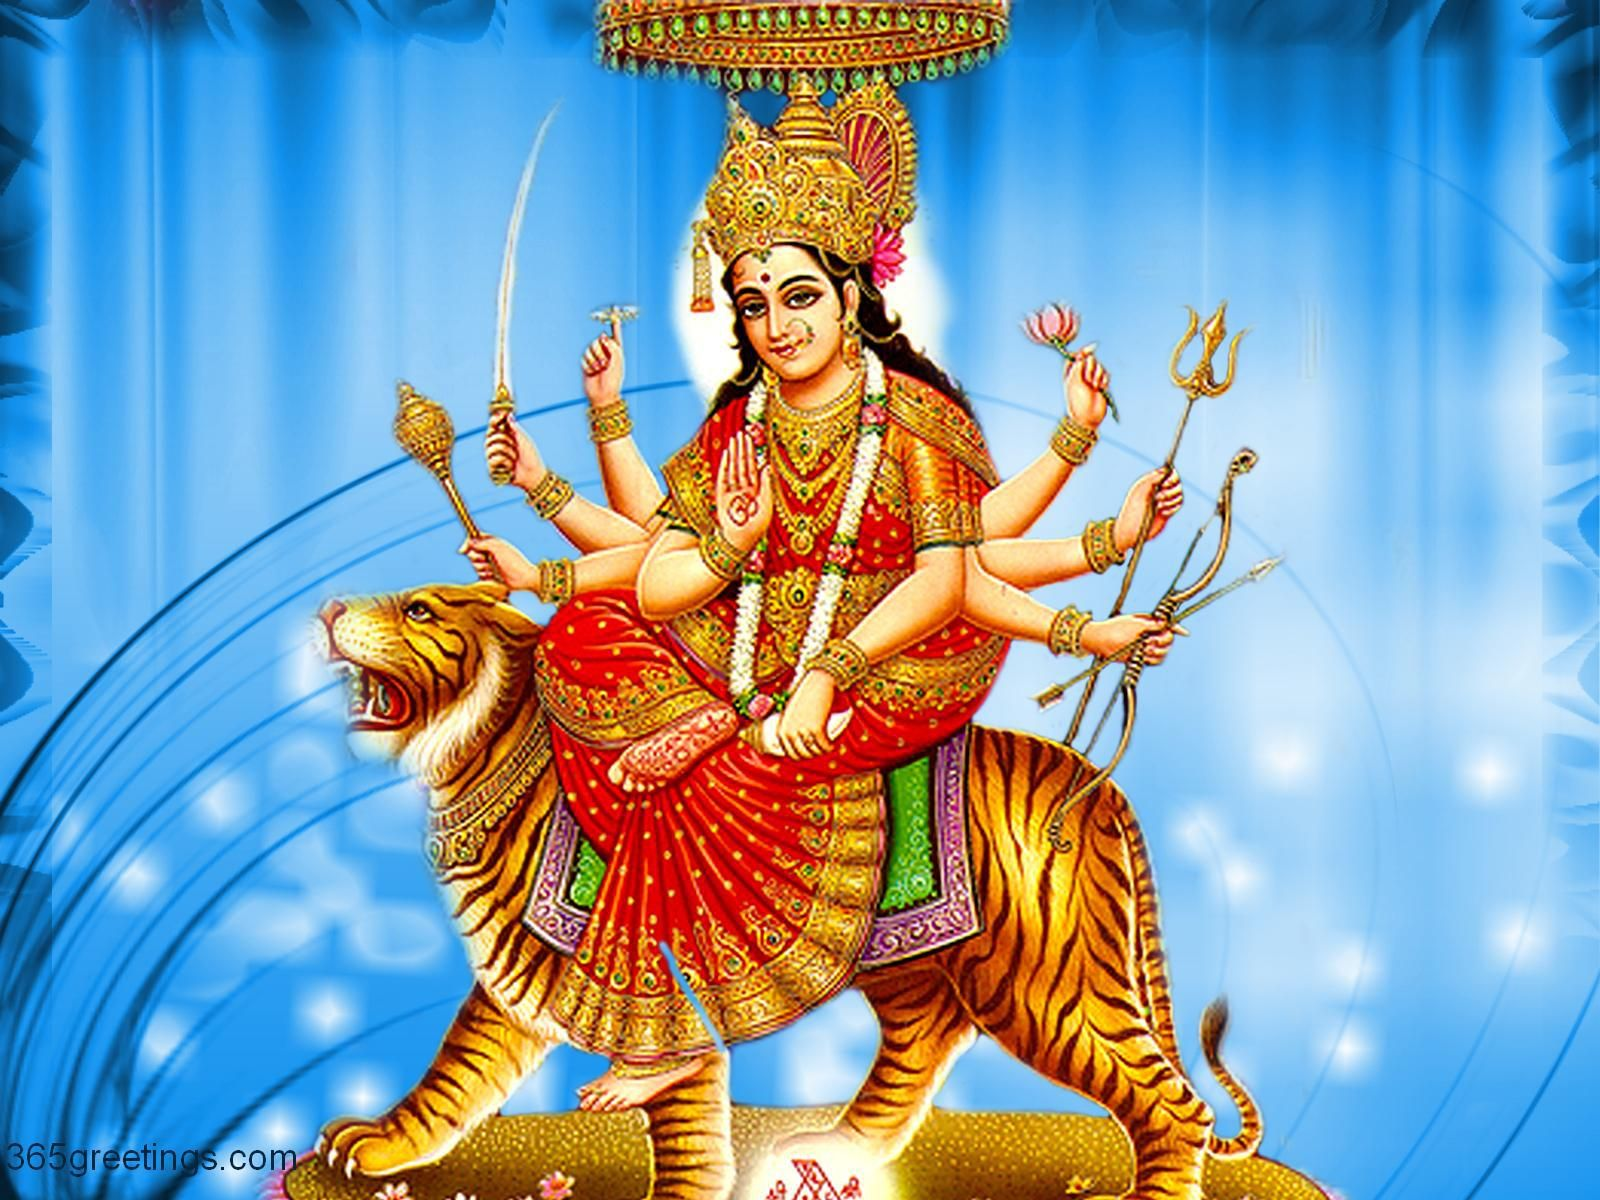 Jai Mata Di Maa Durga Beautiful Hd Wallpapers Collection S Navratri Durga Ashtami Puja Hd Wallpapers Pics Durga Durga Ji Durga Chalisa